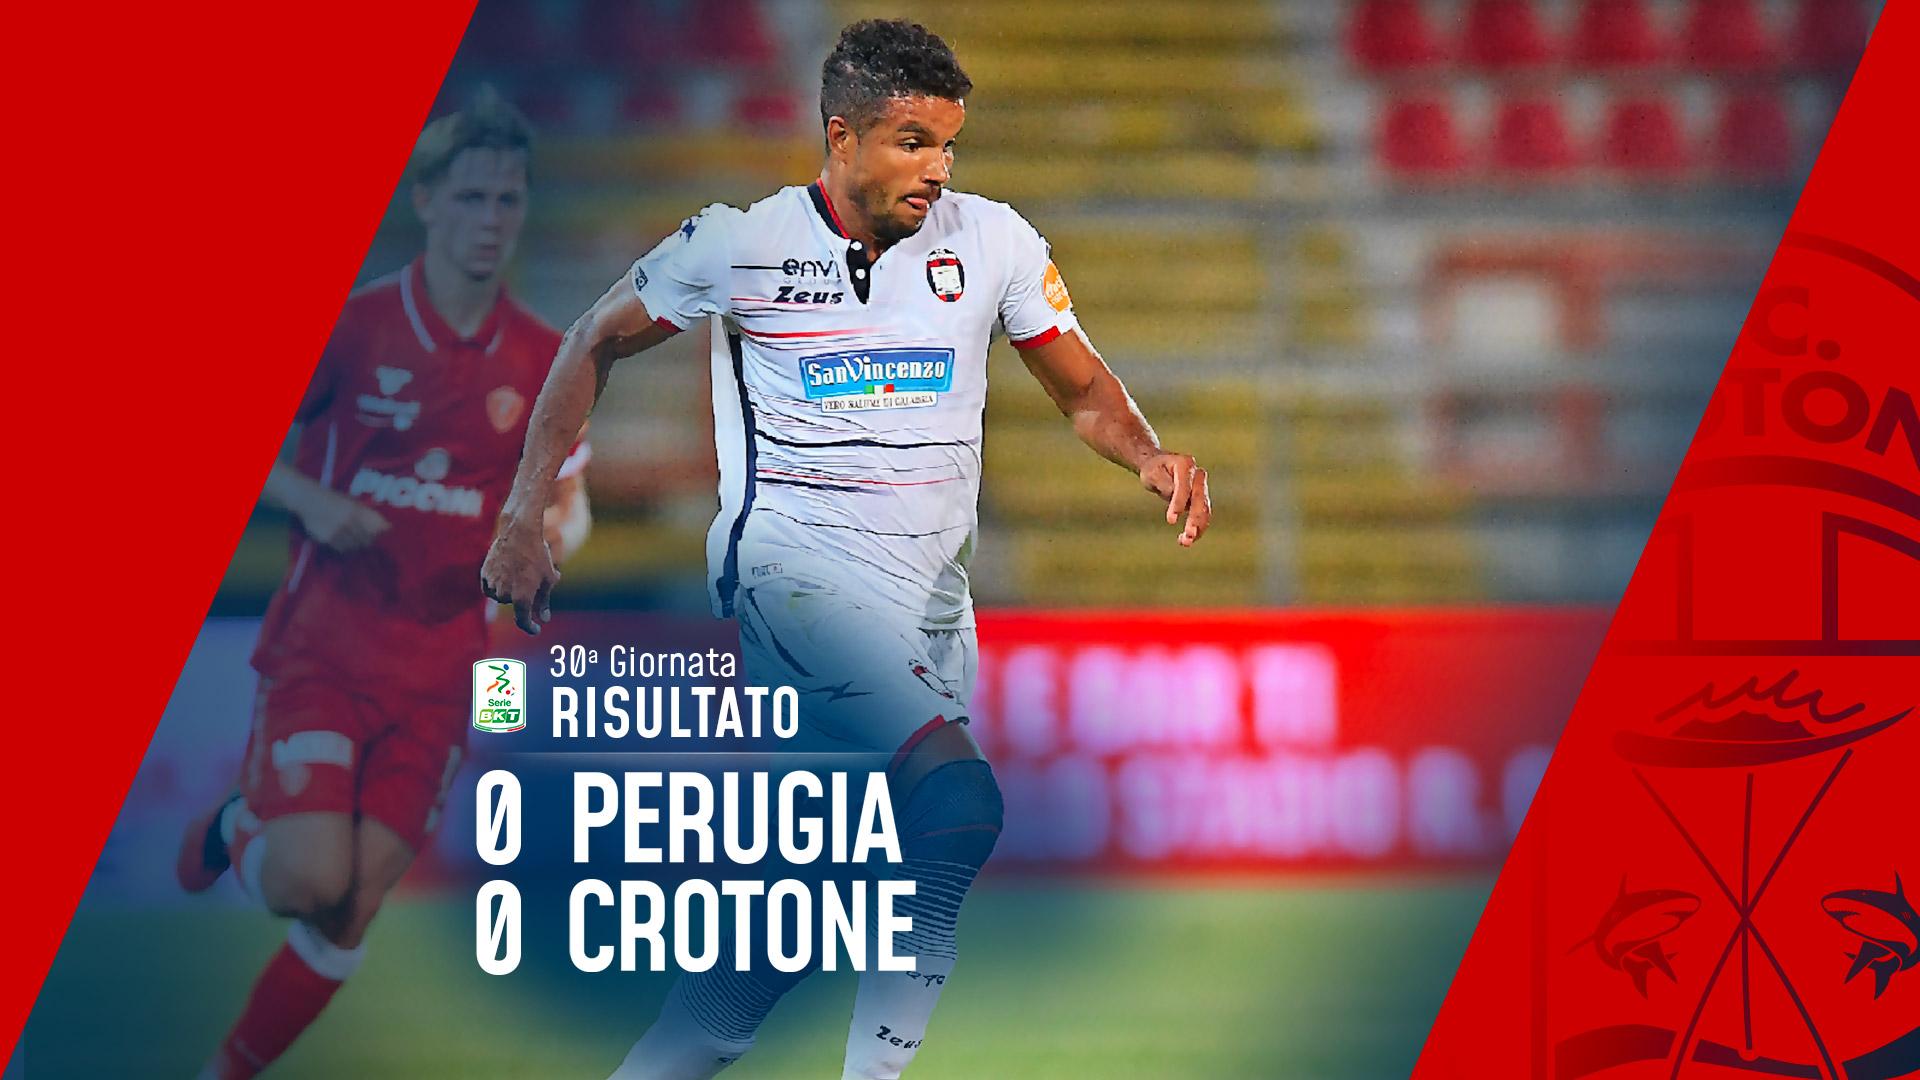 Serie BKT, 30ª giornata: Perugia-Crotone 0-0